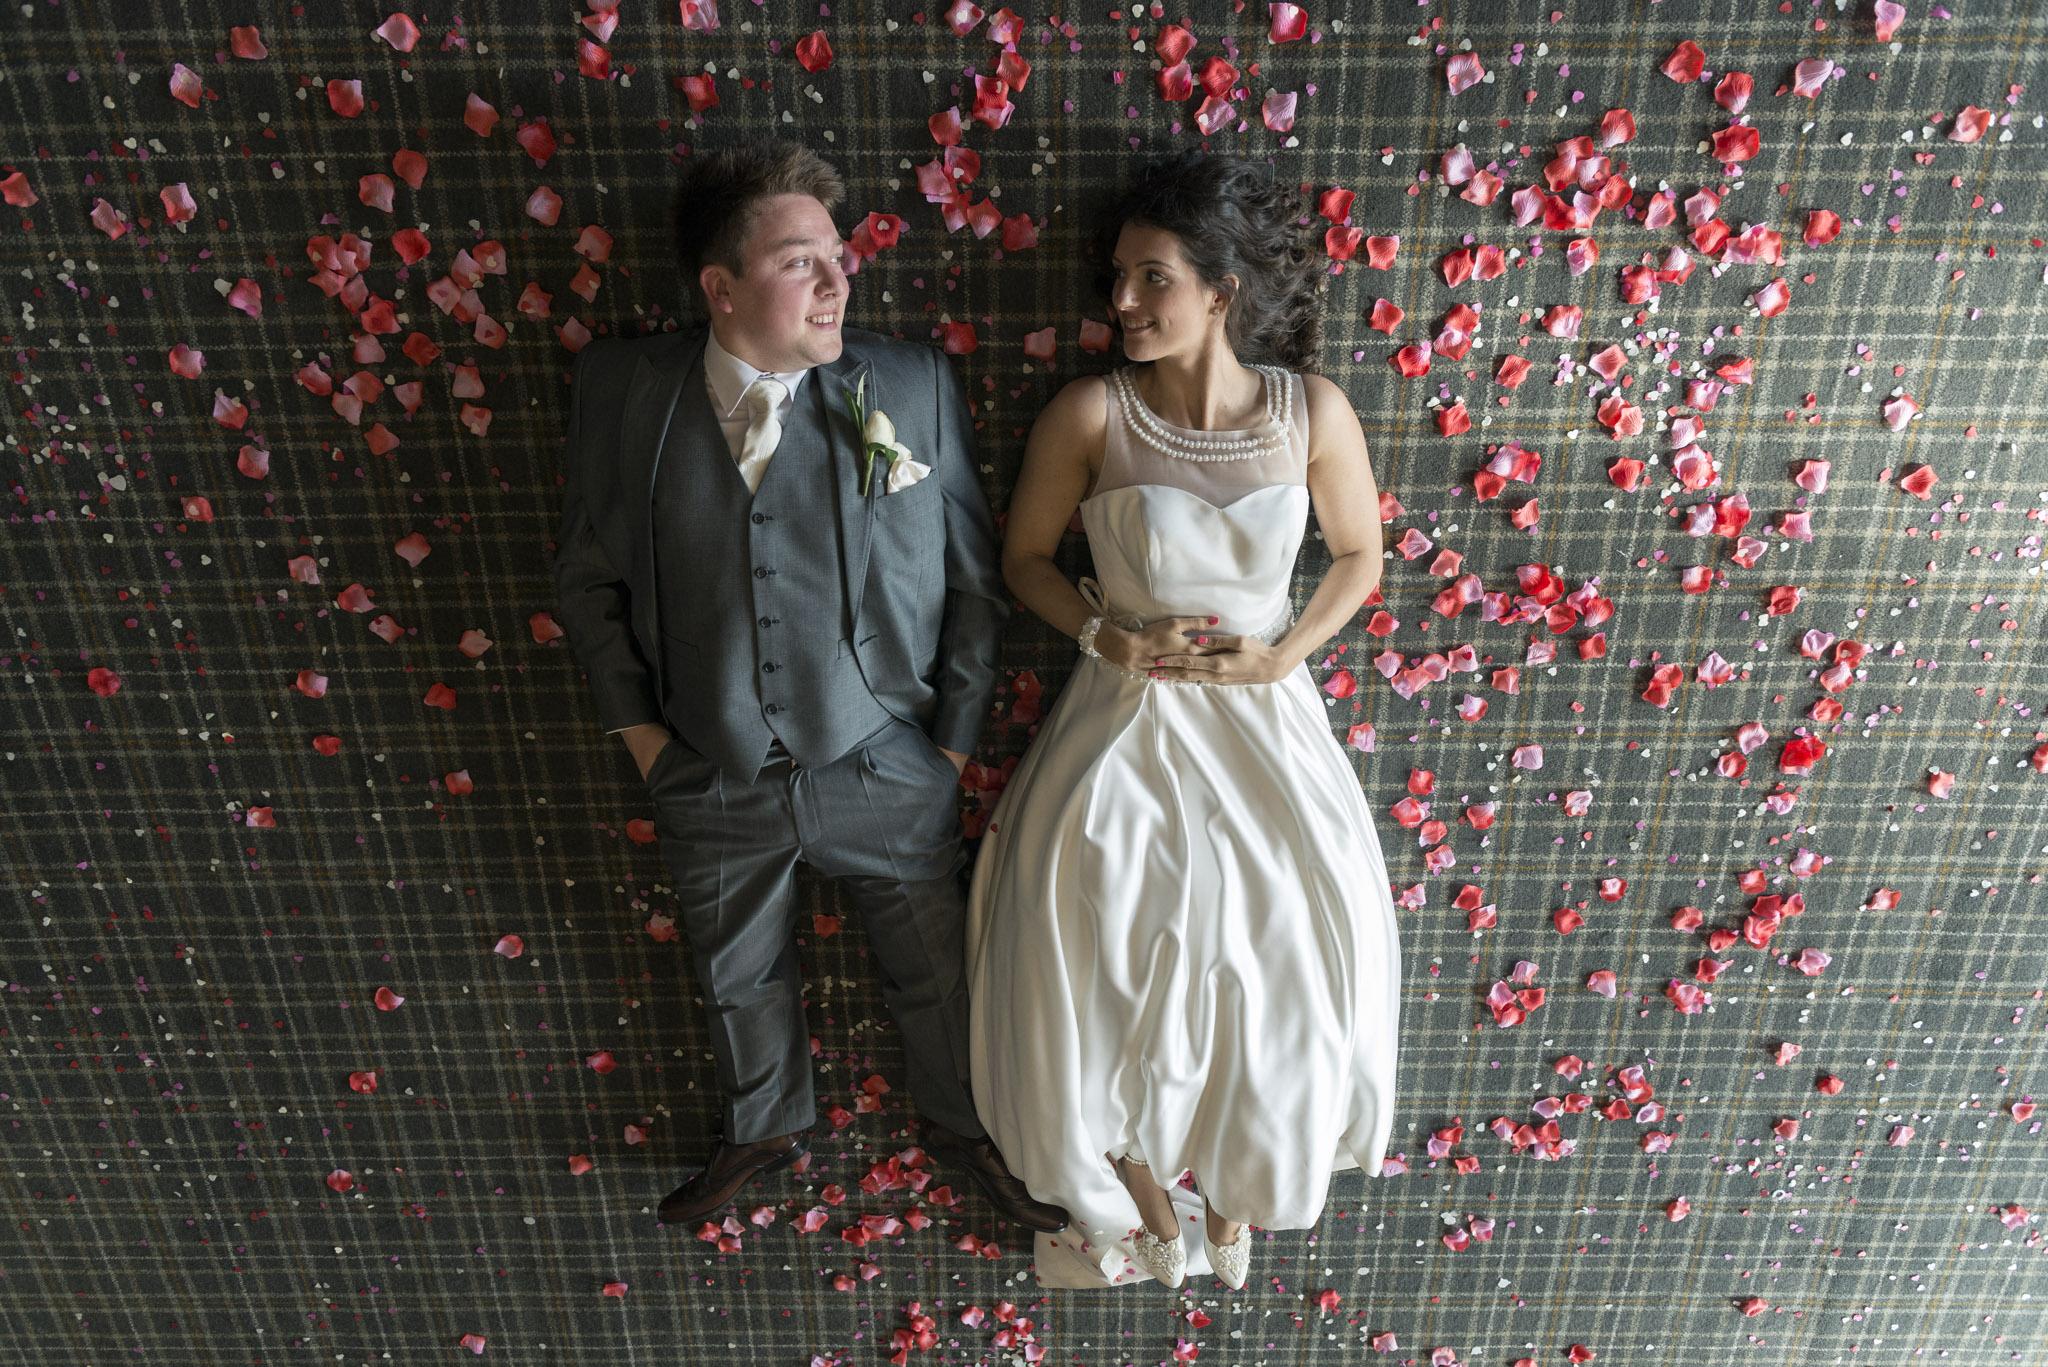 web_hampshire_fun_wedding-6.jpg